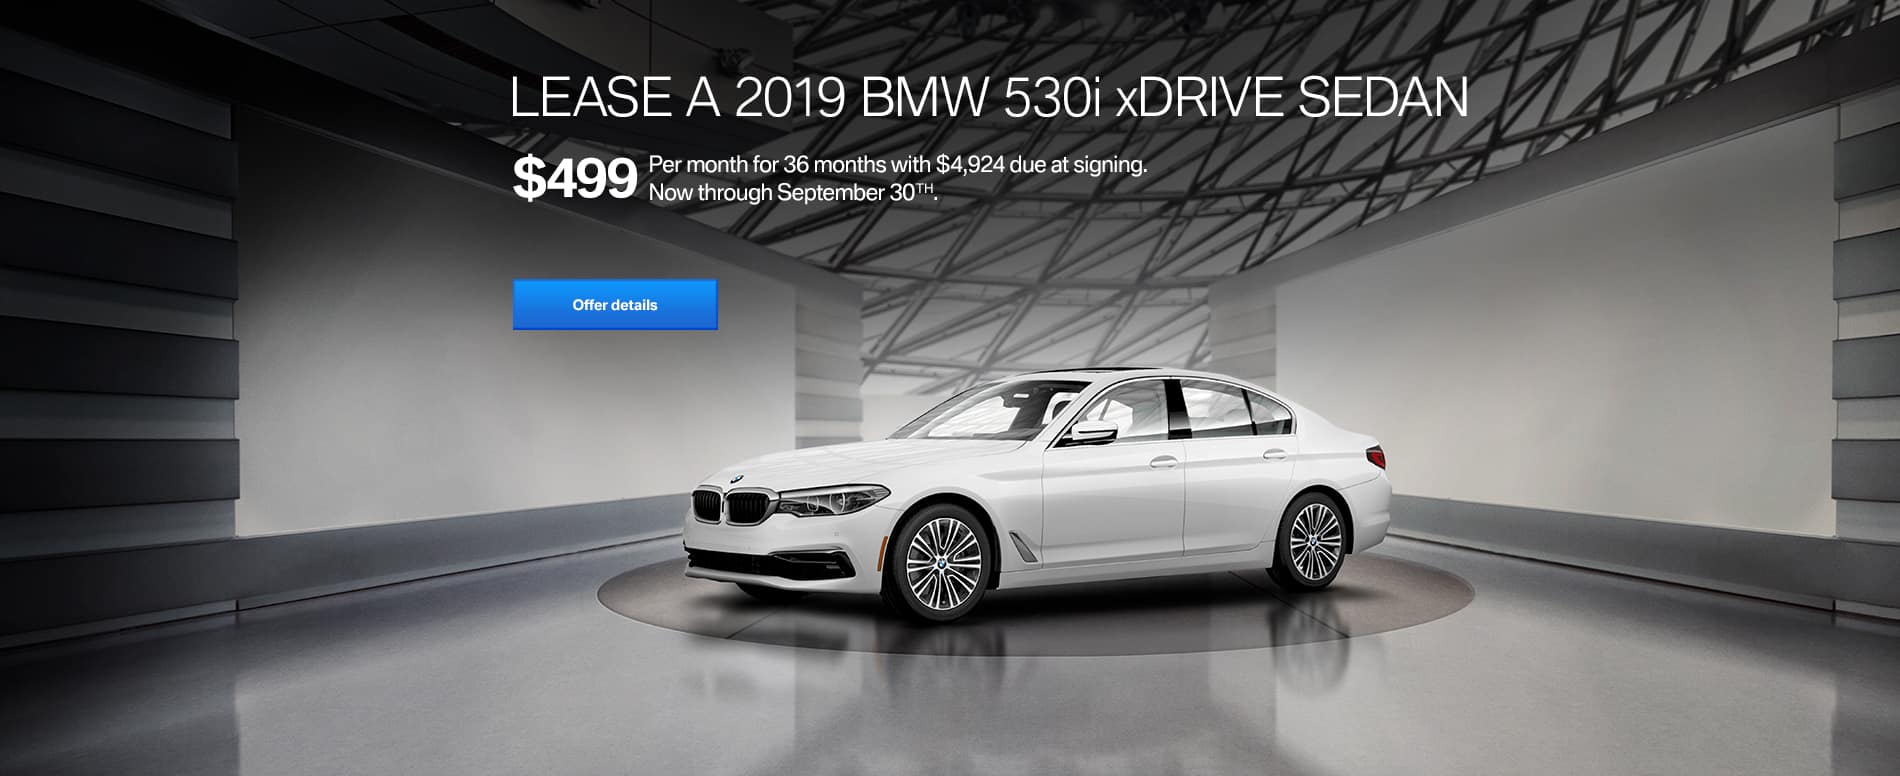 BMW Dealership Annapolis MD | BMW of Annapolis